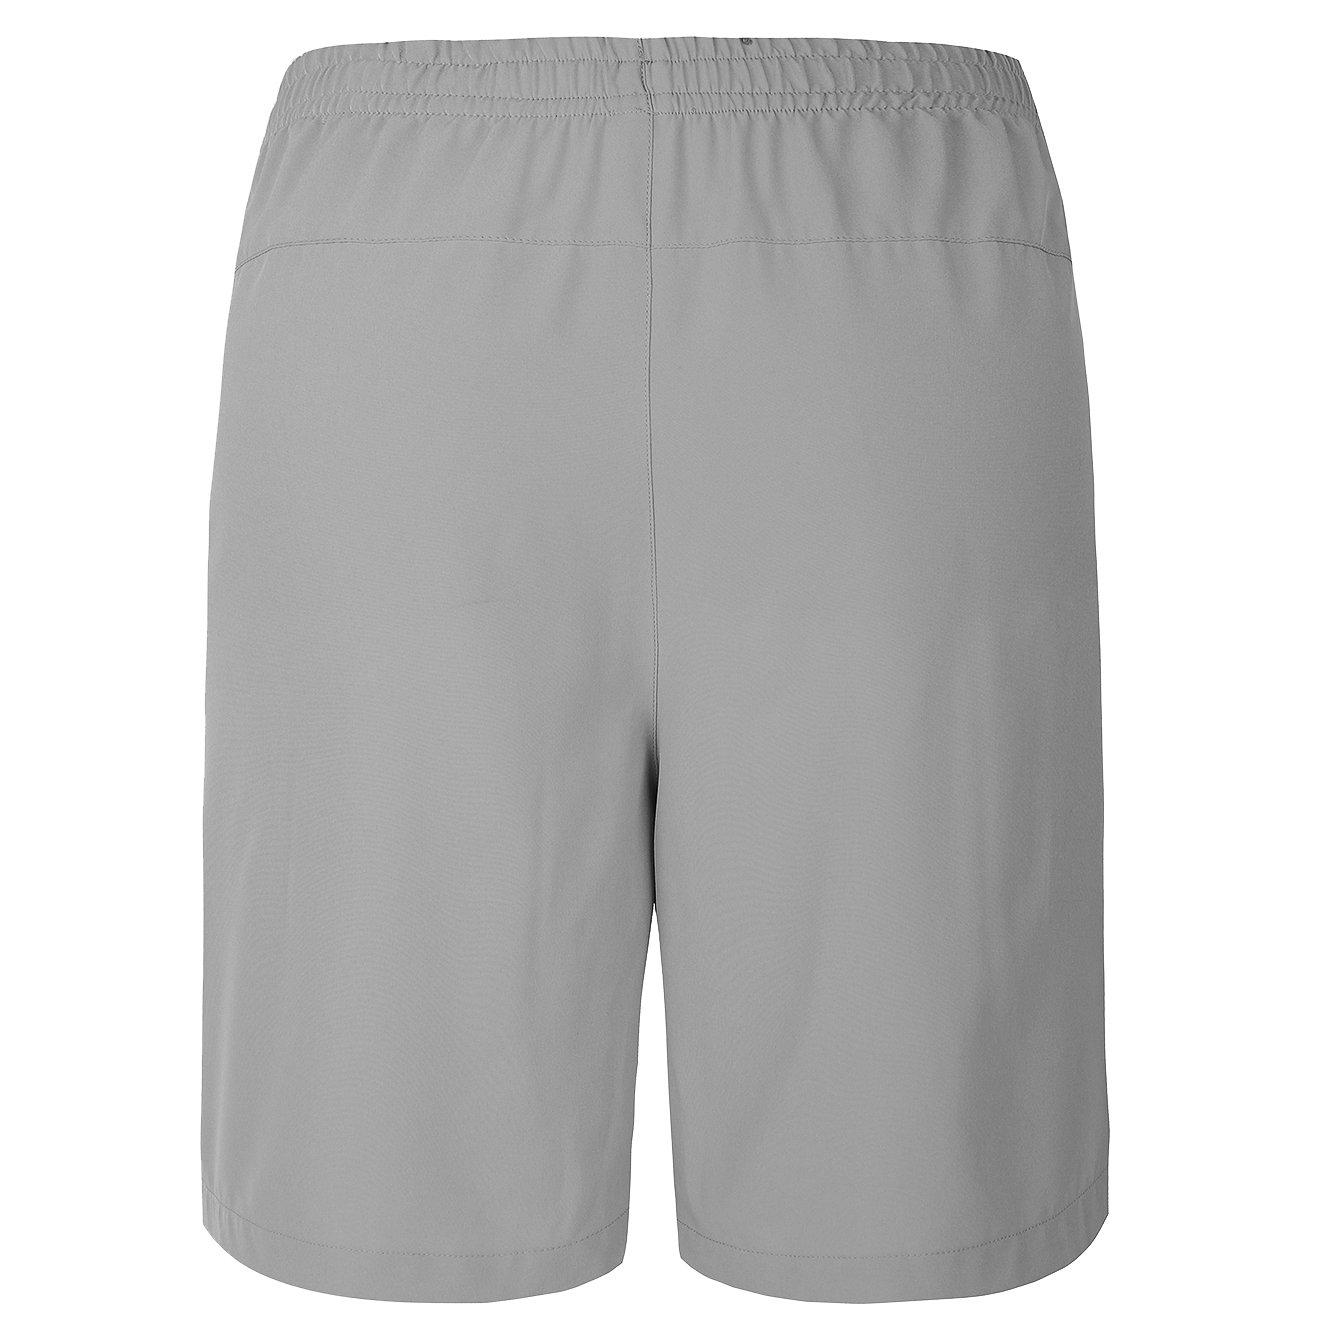 Gititlys Men\'s Shorts with Pockets 95% Terylene and 5% Spandex (Light Gray, Large)